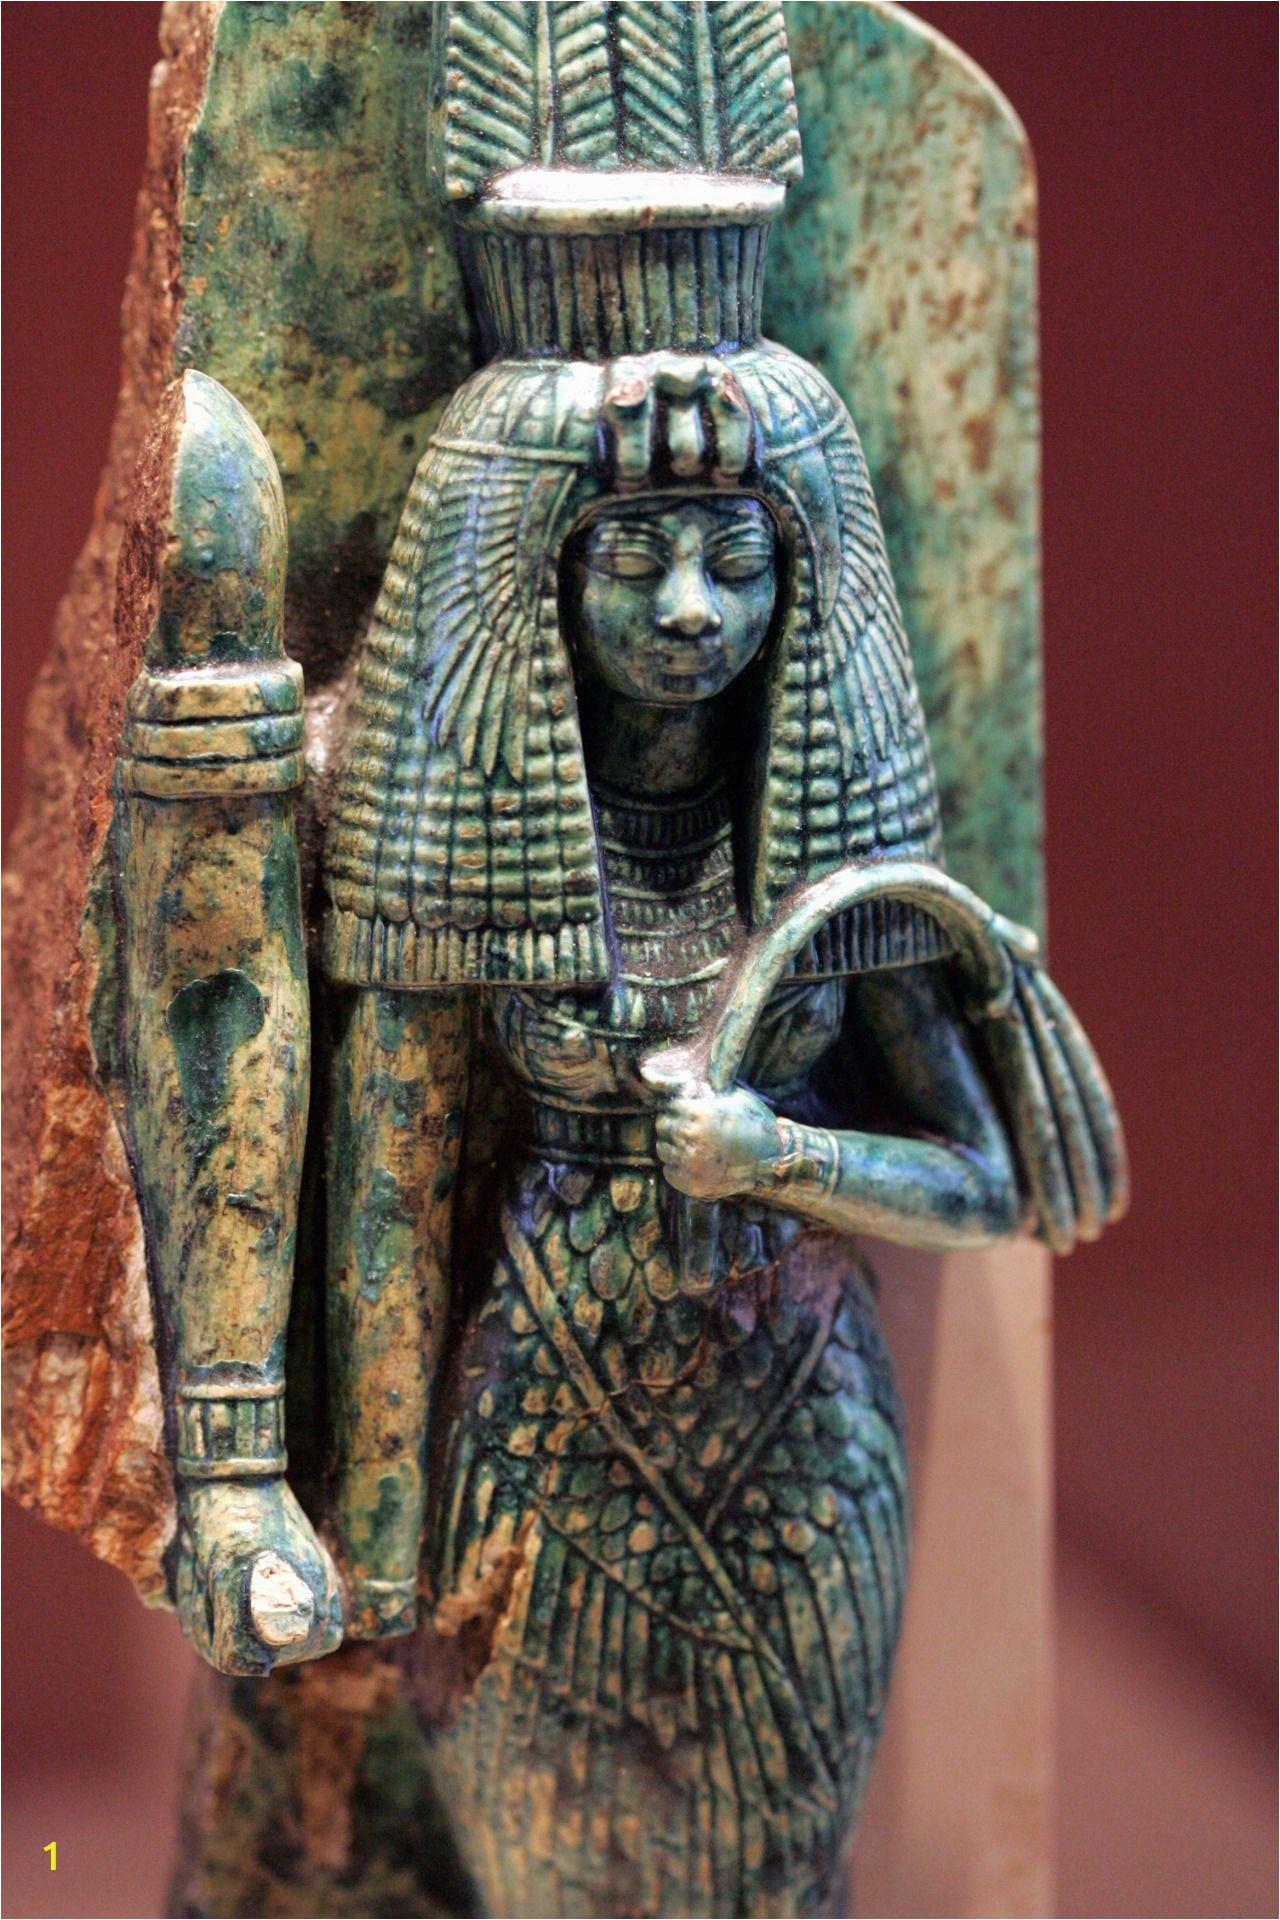 Amenhotep and Nefertiti Wall Murals Emthehistorygirl Queen Tiye Dressed as the Goddess Nekhbet